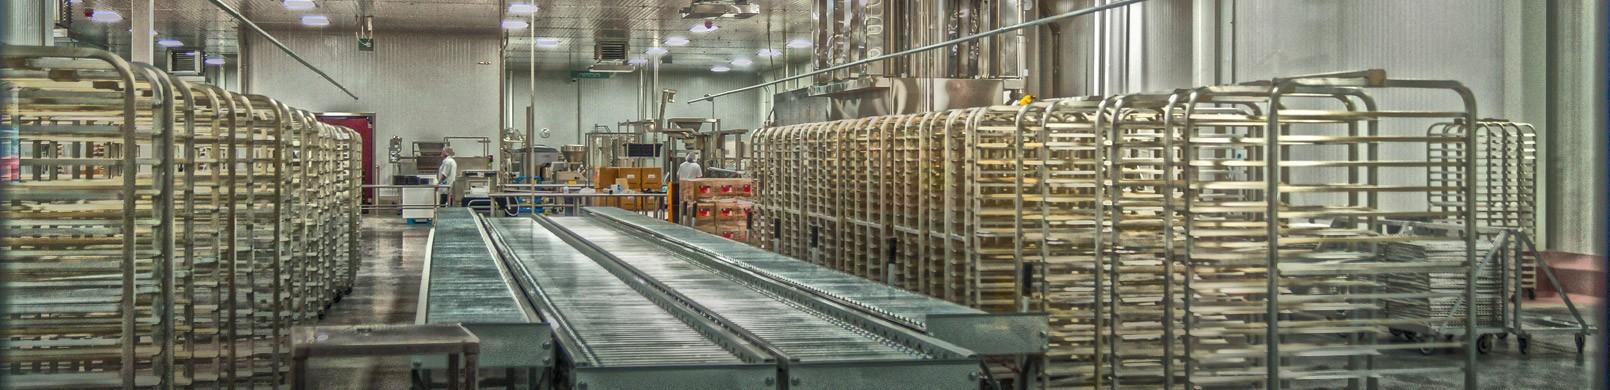 Industrial Adams Electric